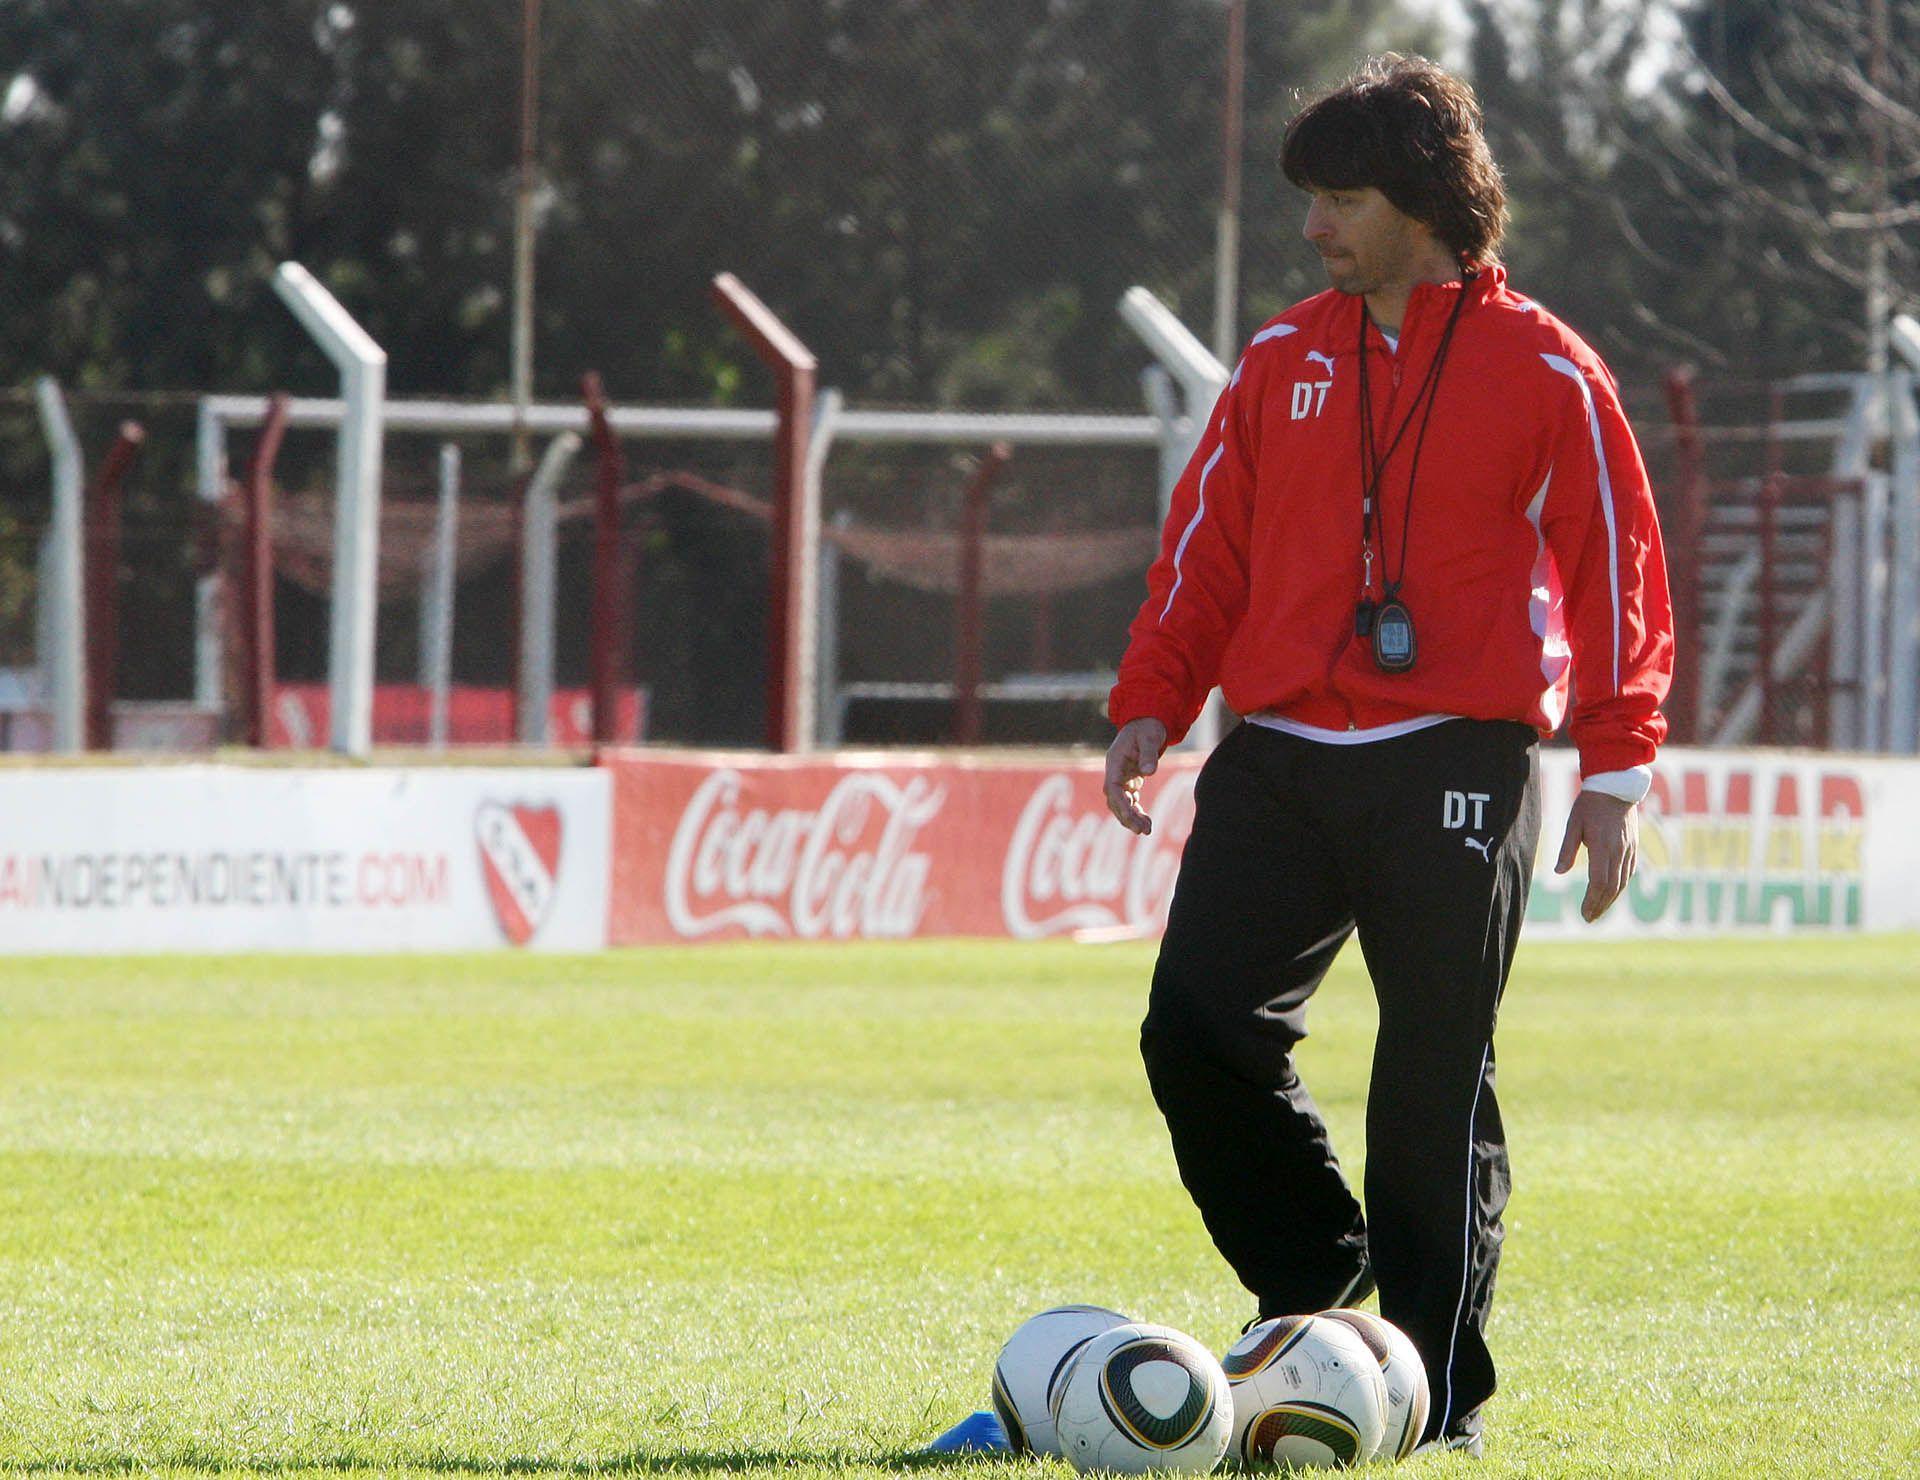 Daniel Garnero DT de Independiente